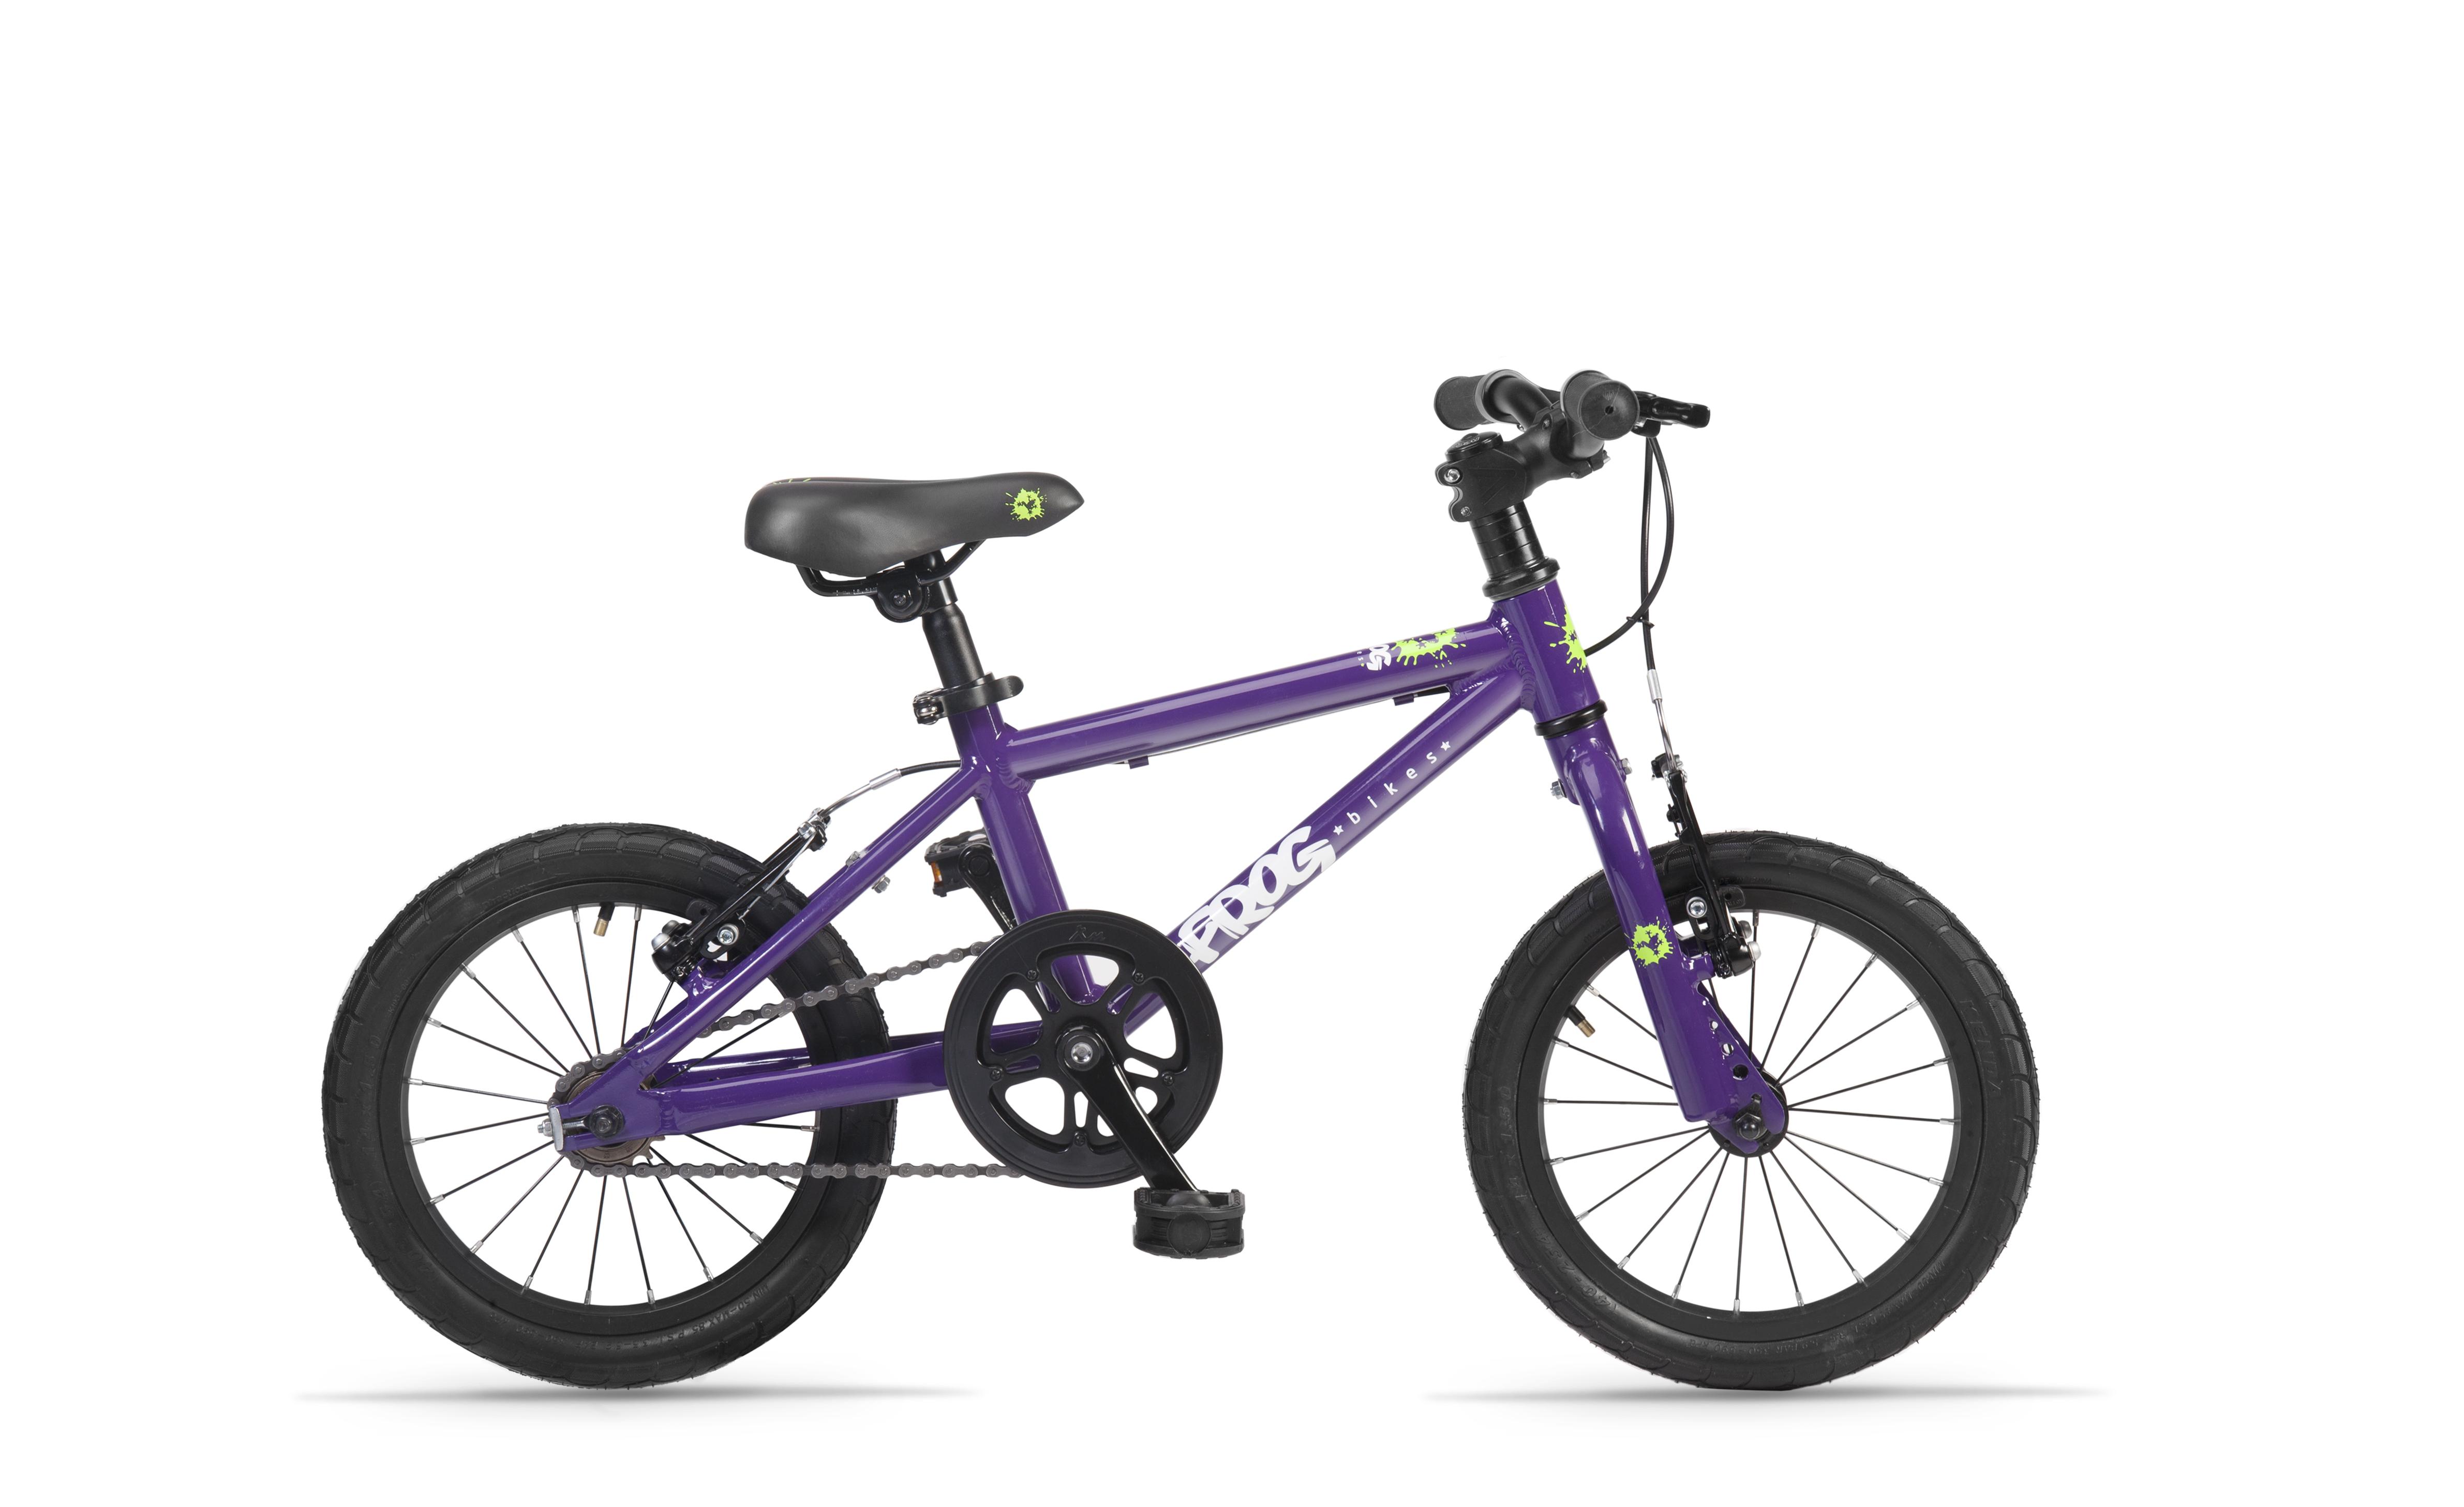 Frog 43 purple